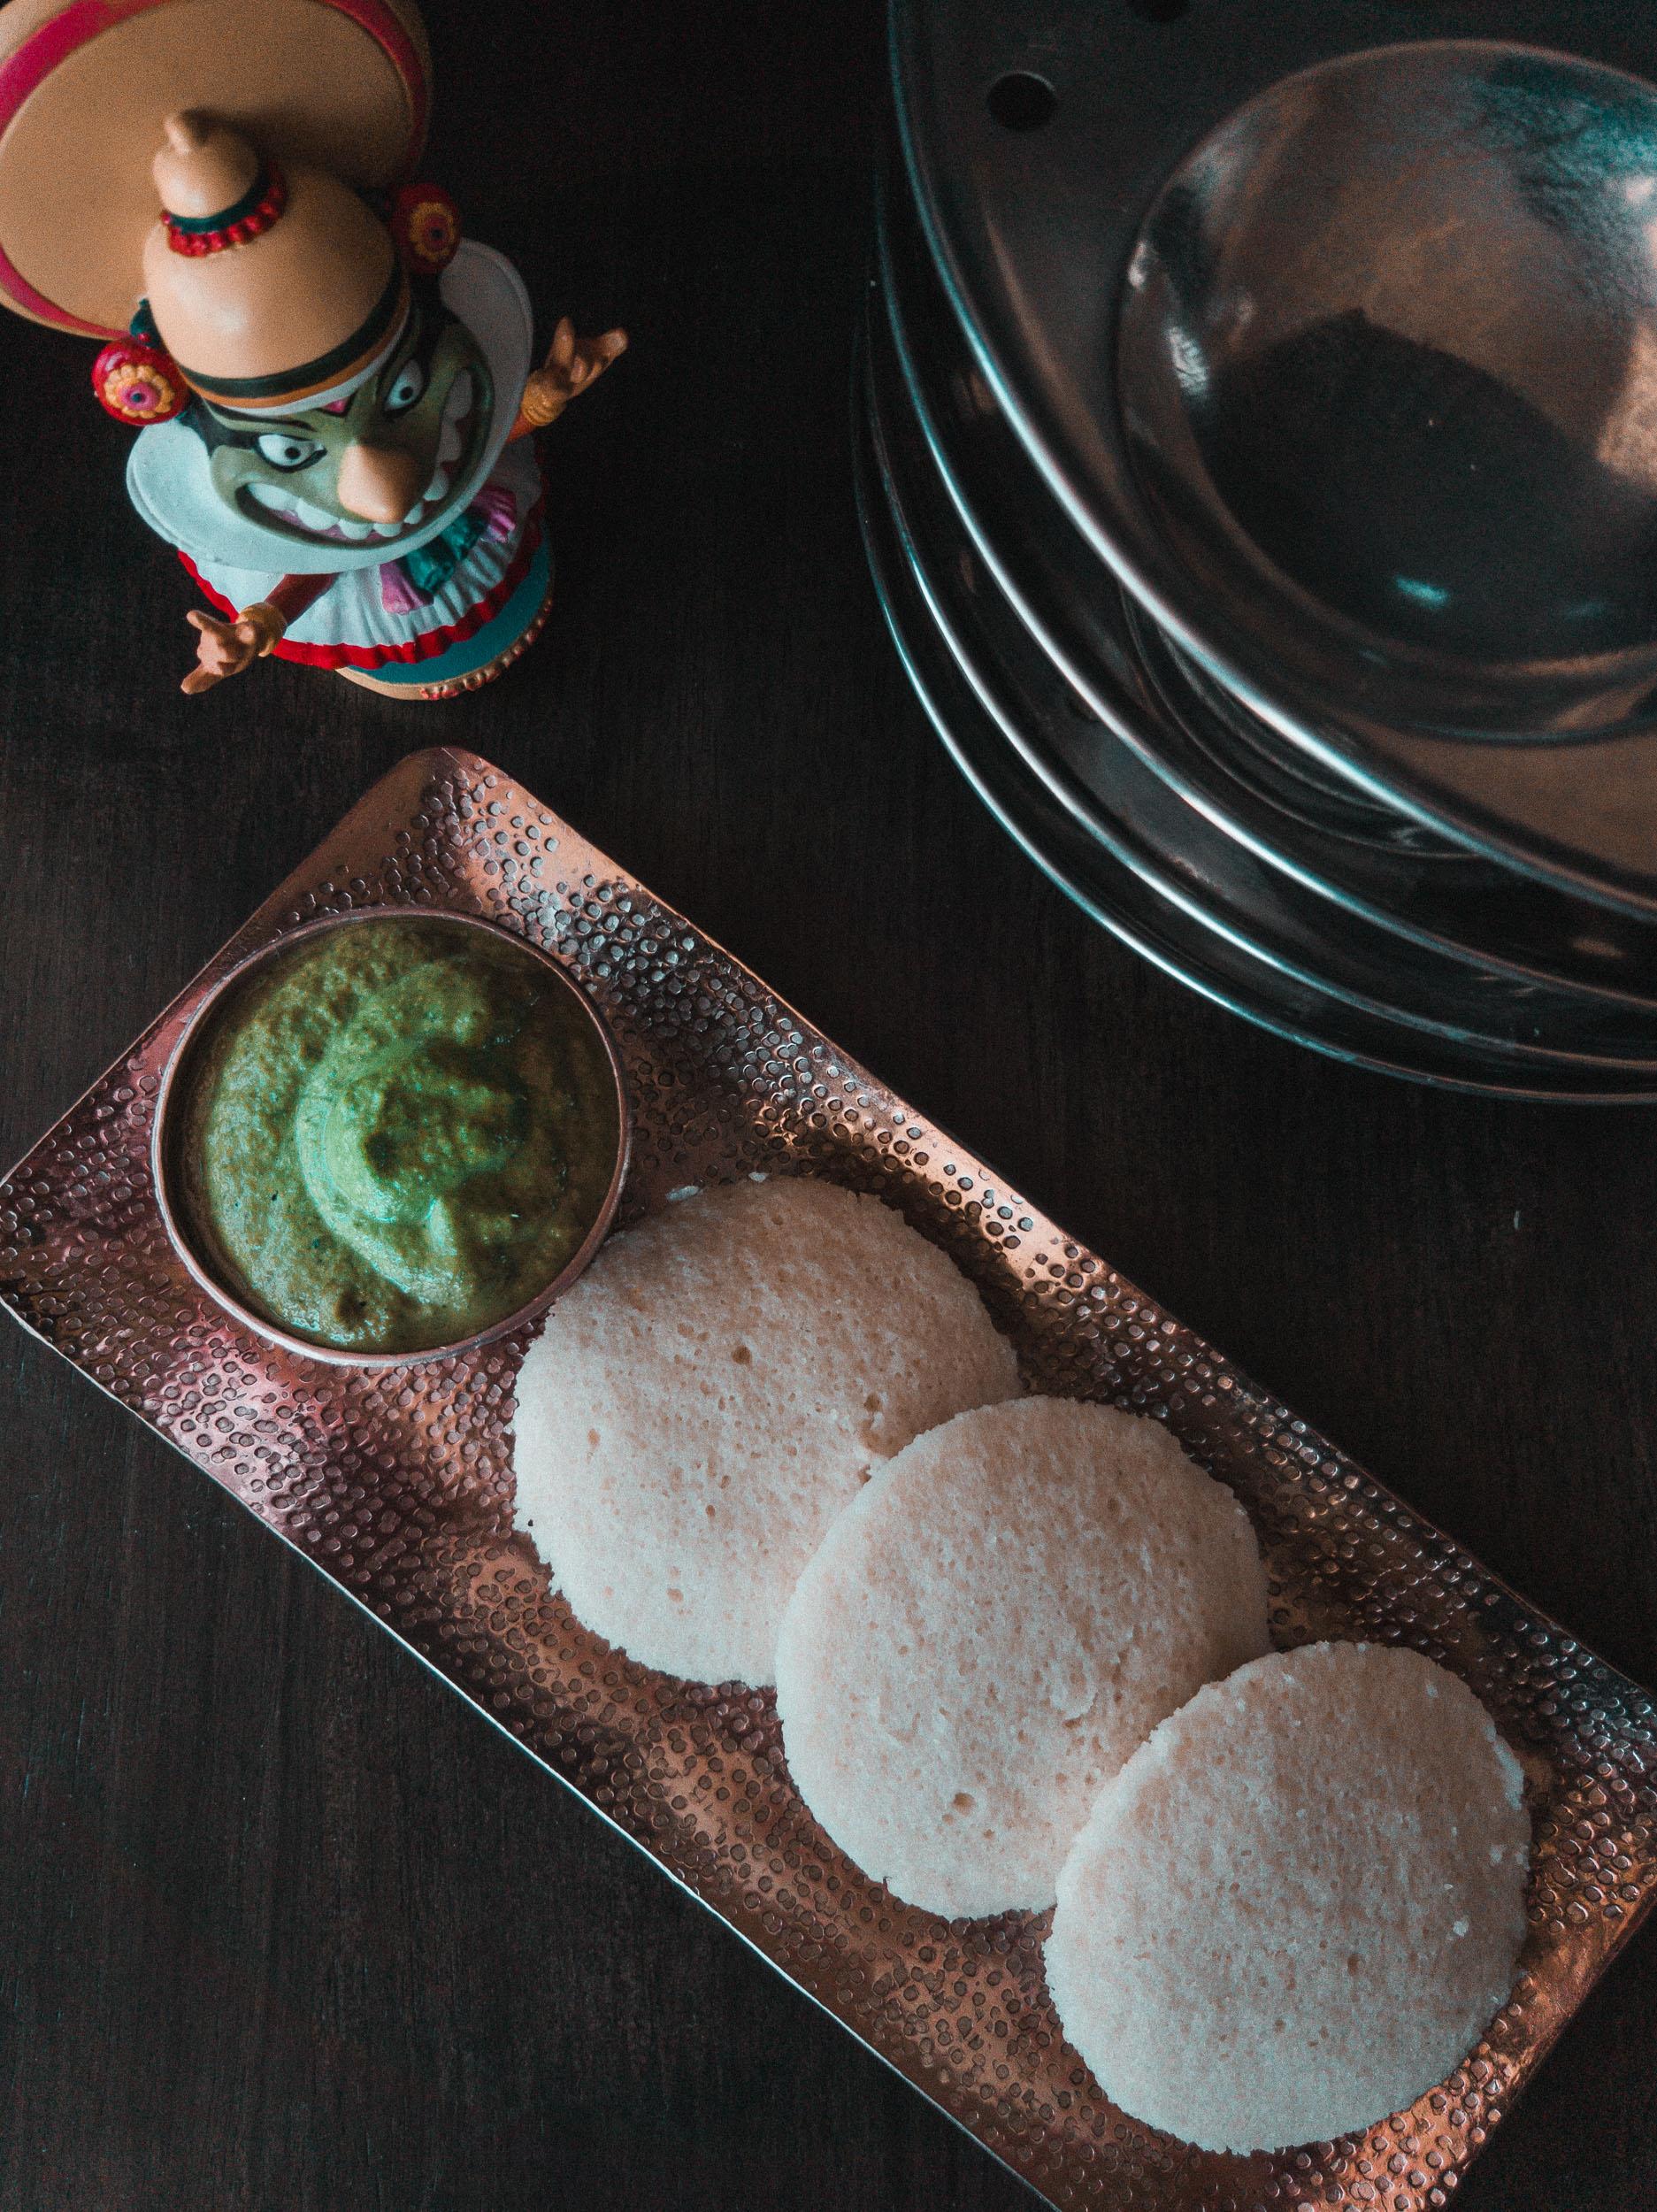 Flatlay of idli with green peanut coconut coriander chutney alongside an idli stand and kathakali dancer boblehead